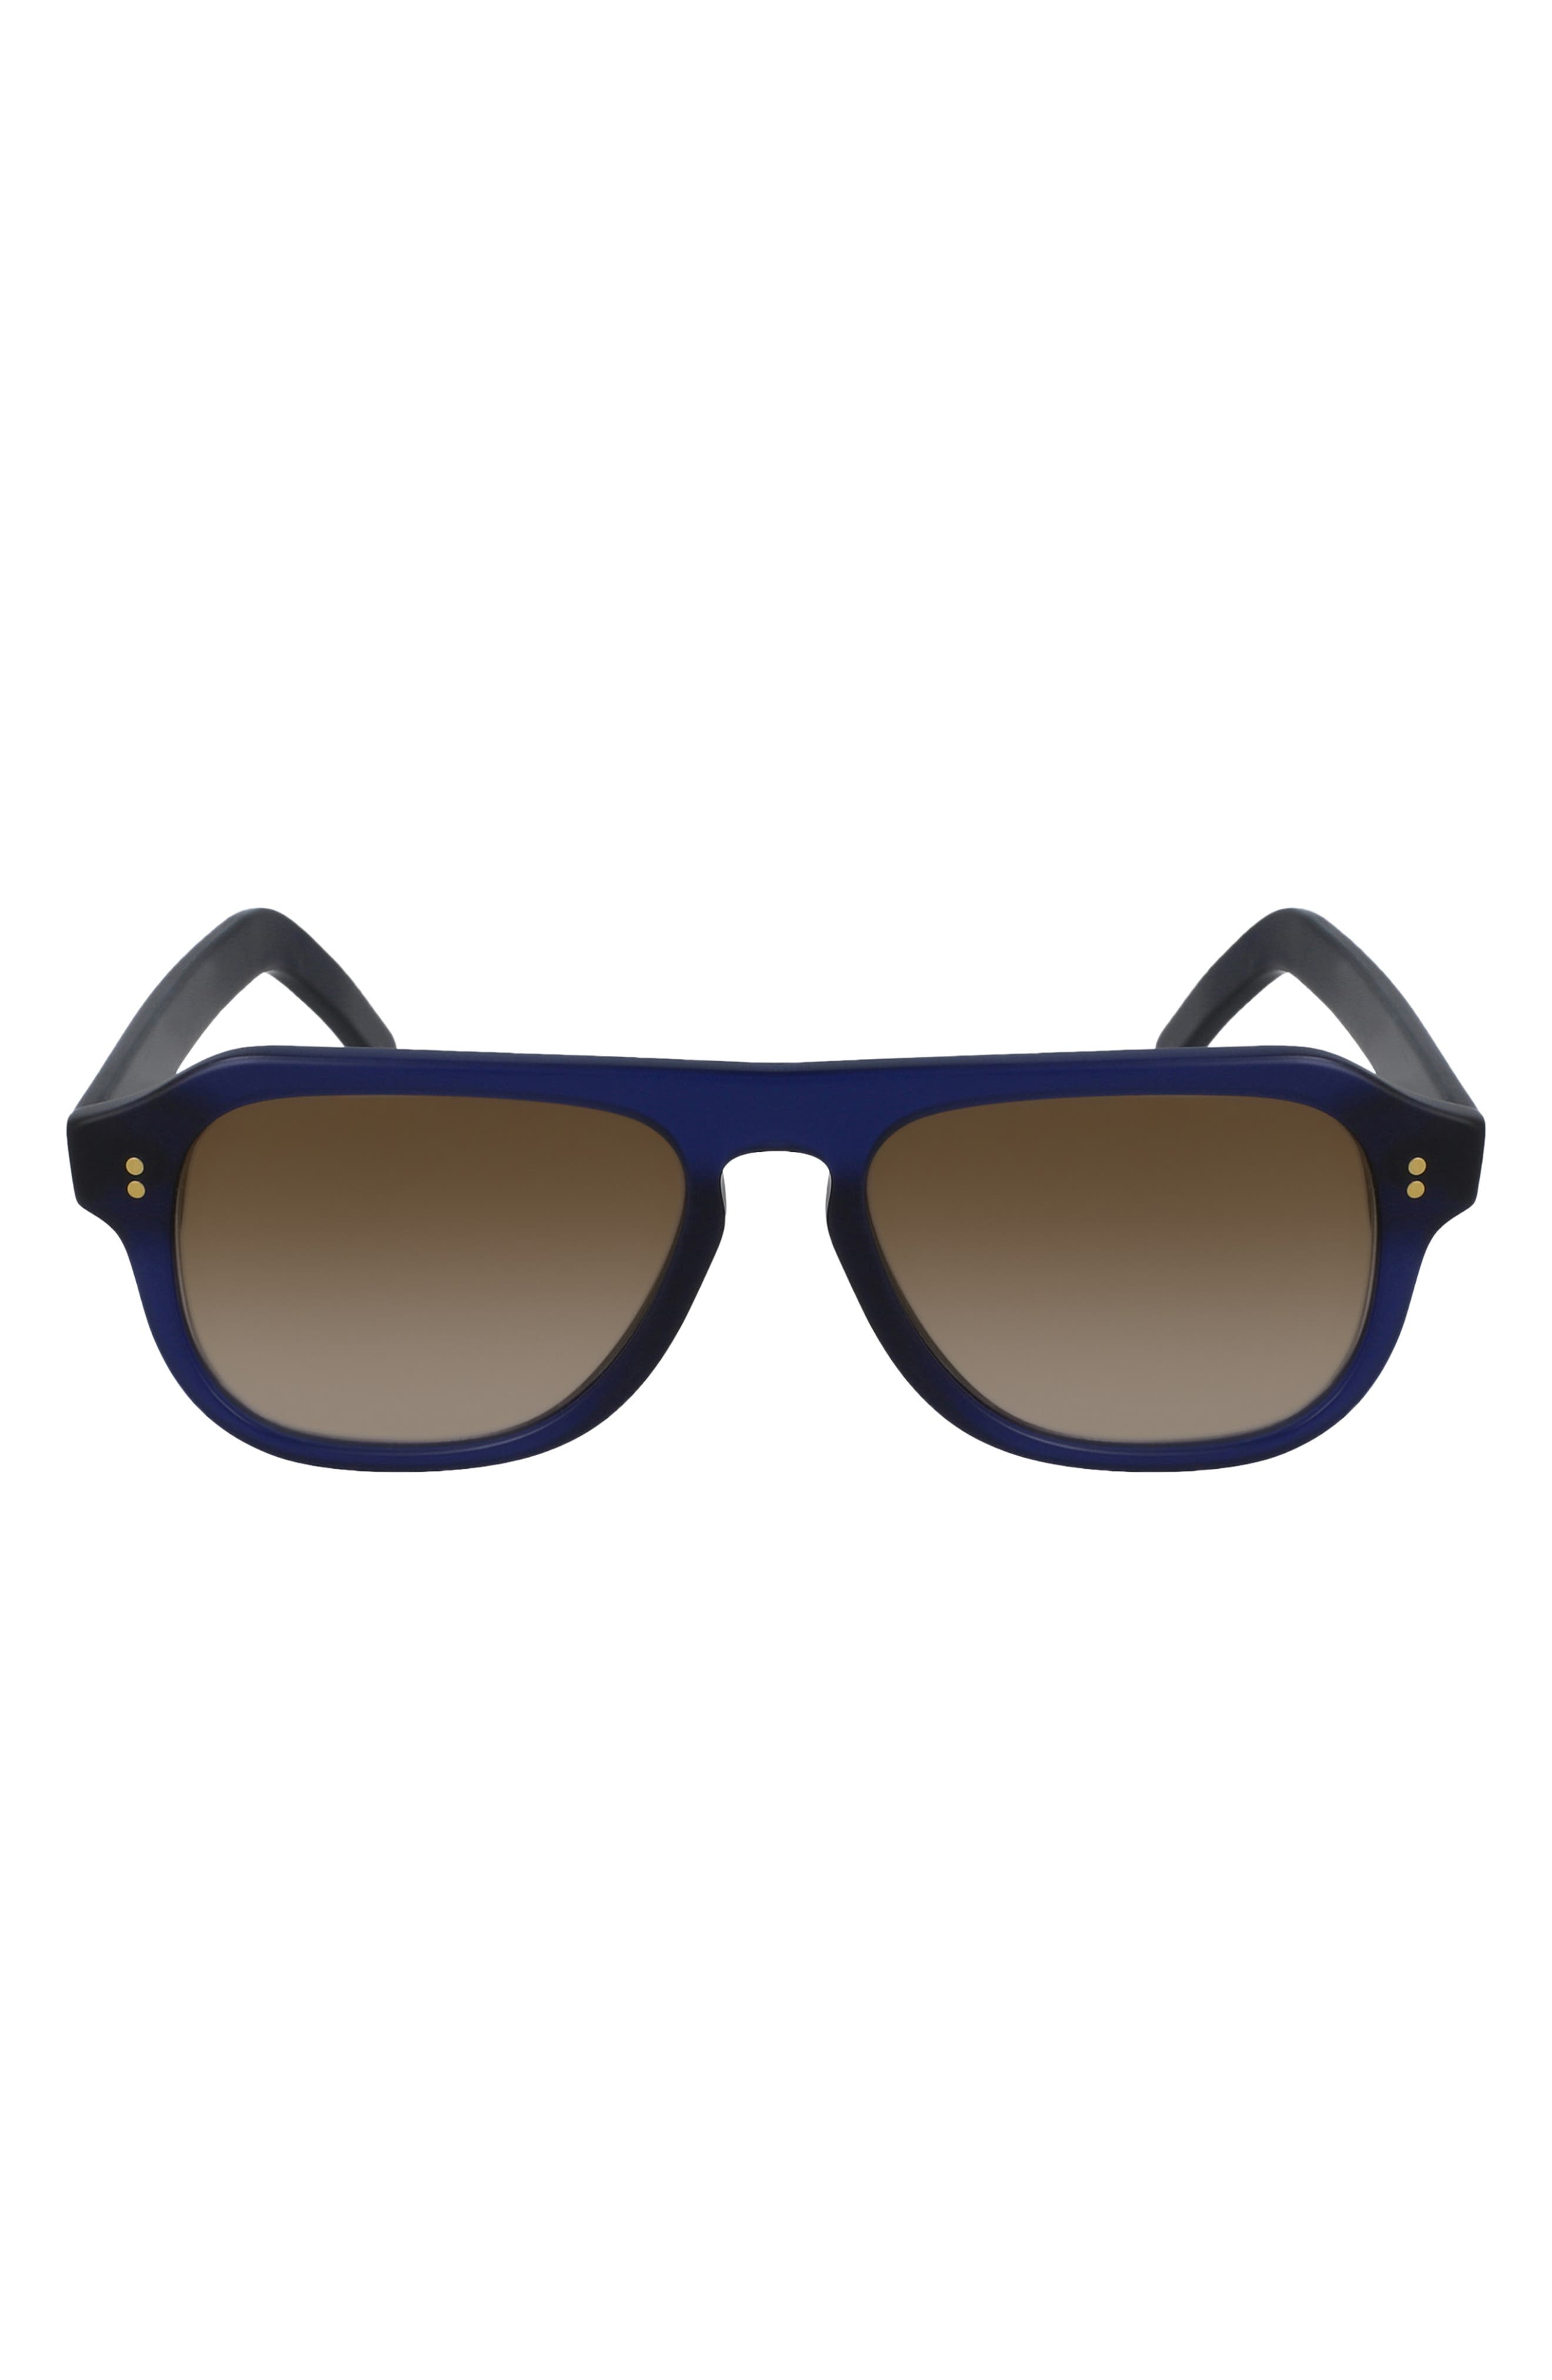 53mm Flat Top Aviator Sunglasses